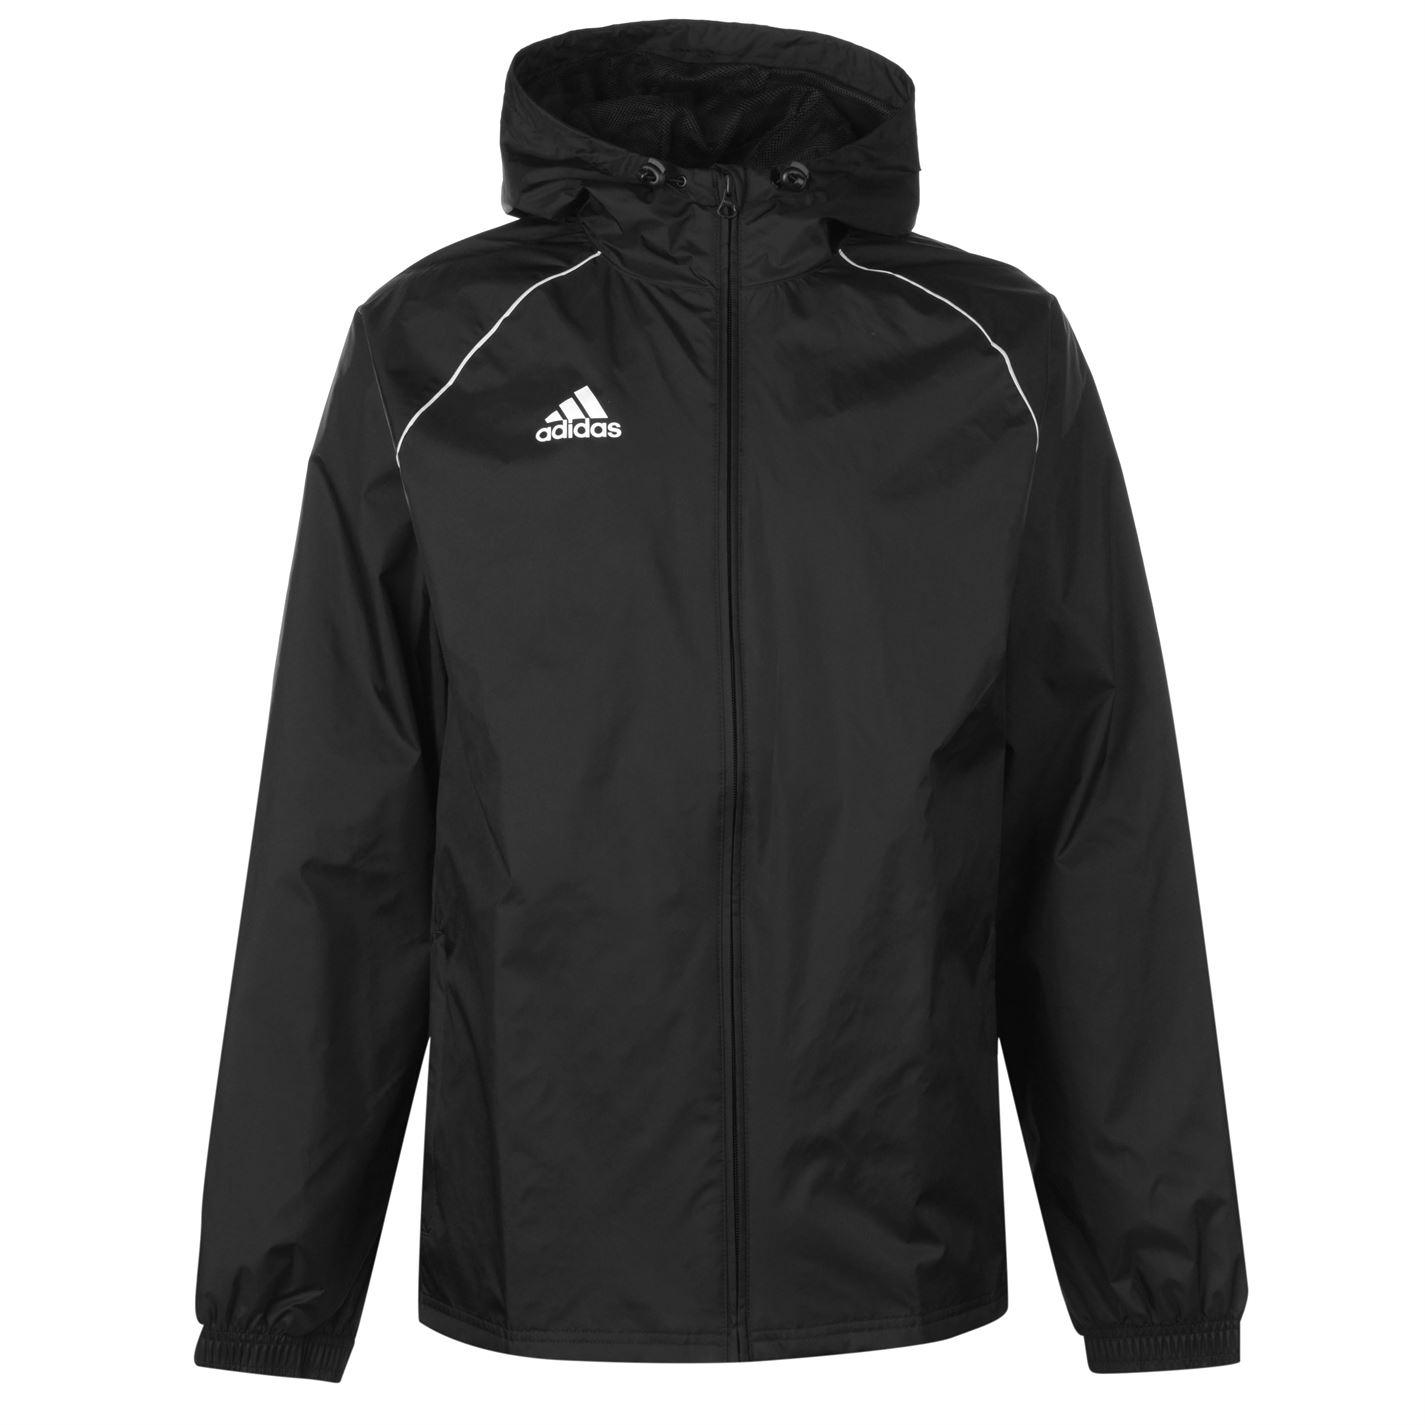 Adidas Core Rain Jacket Mens